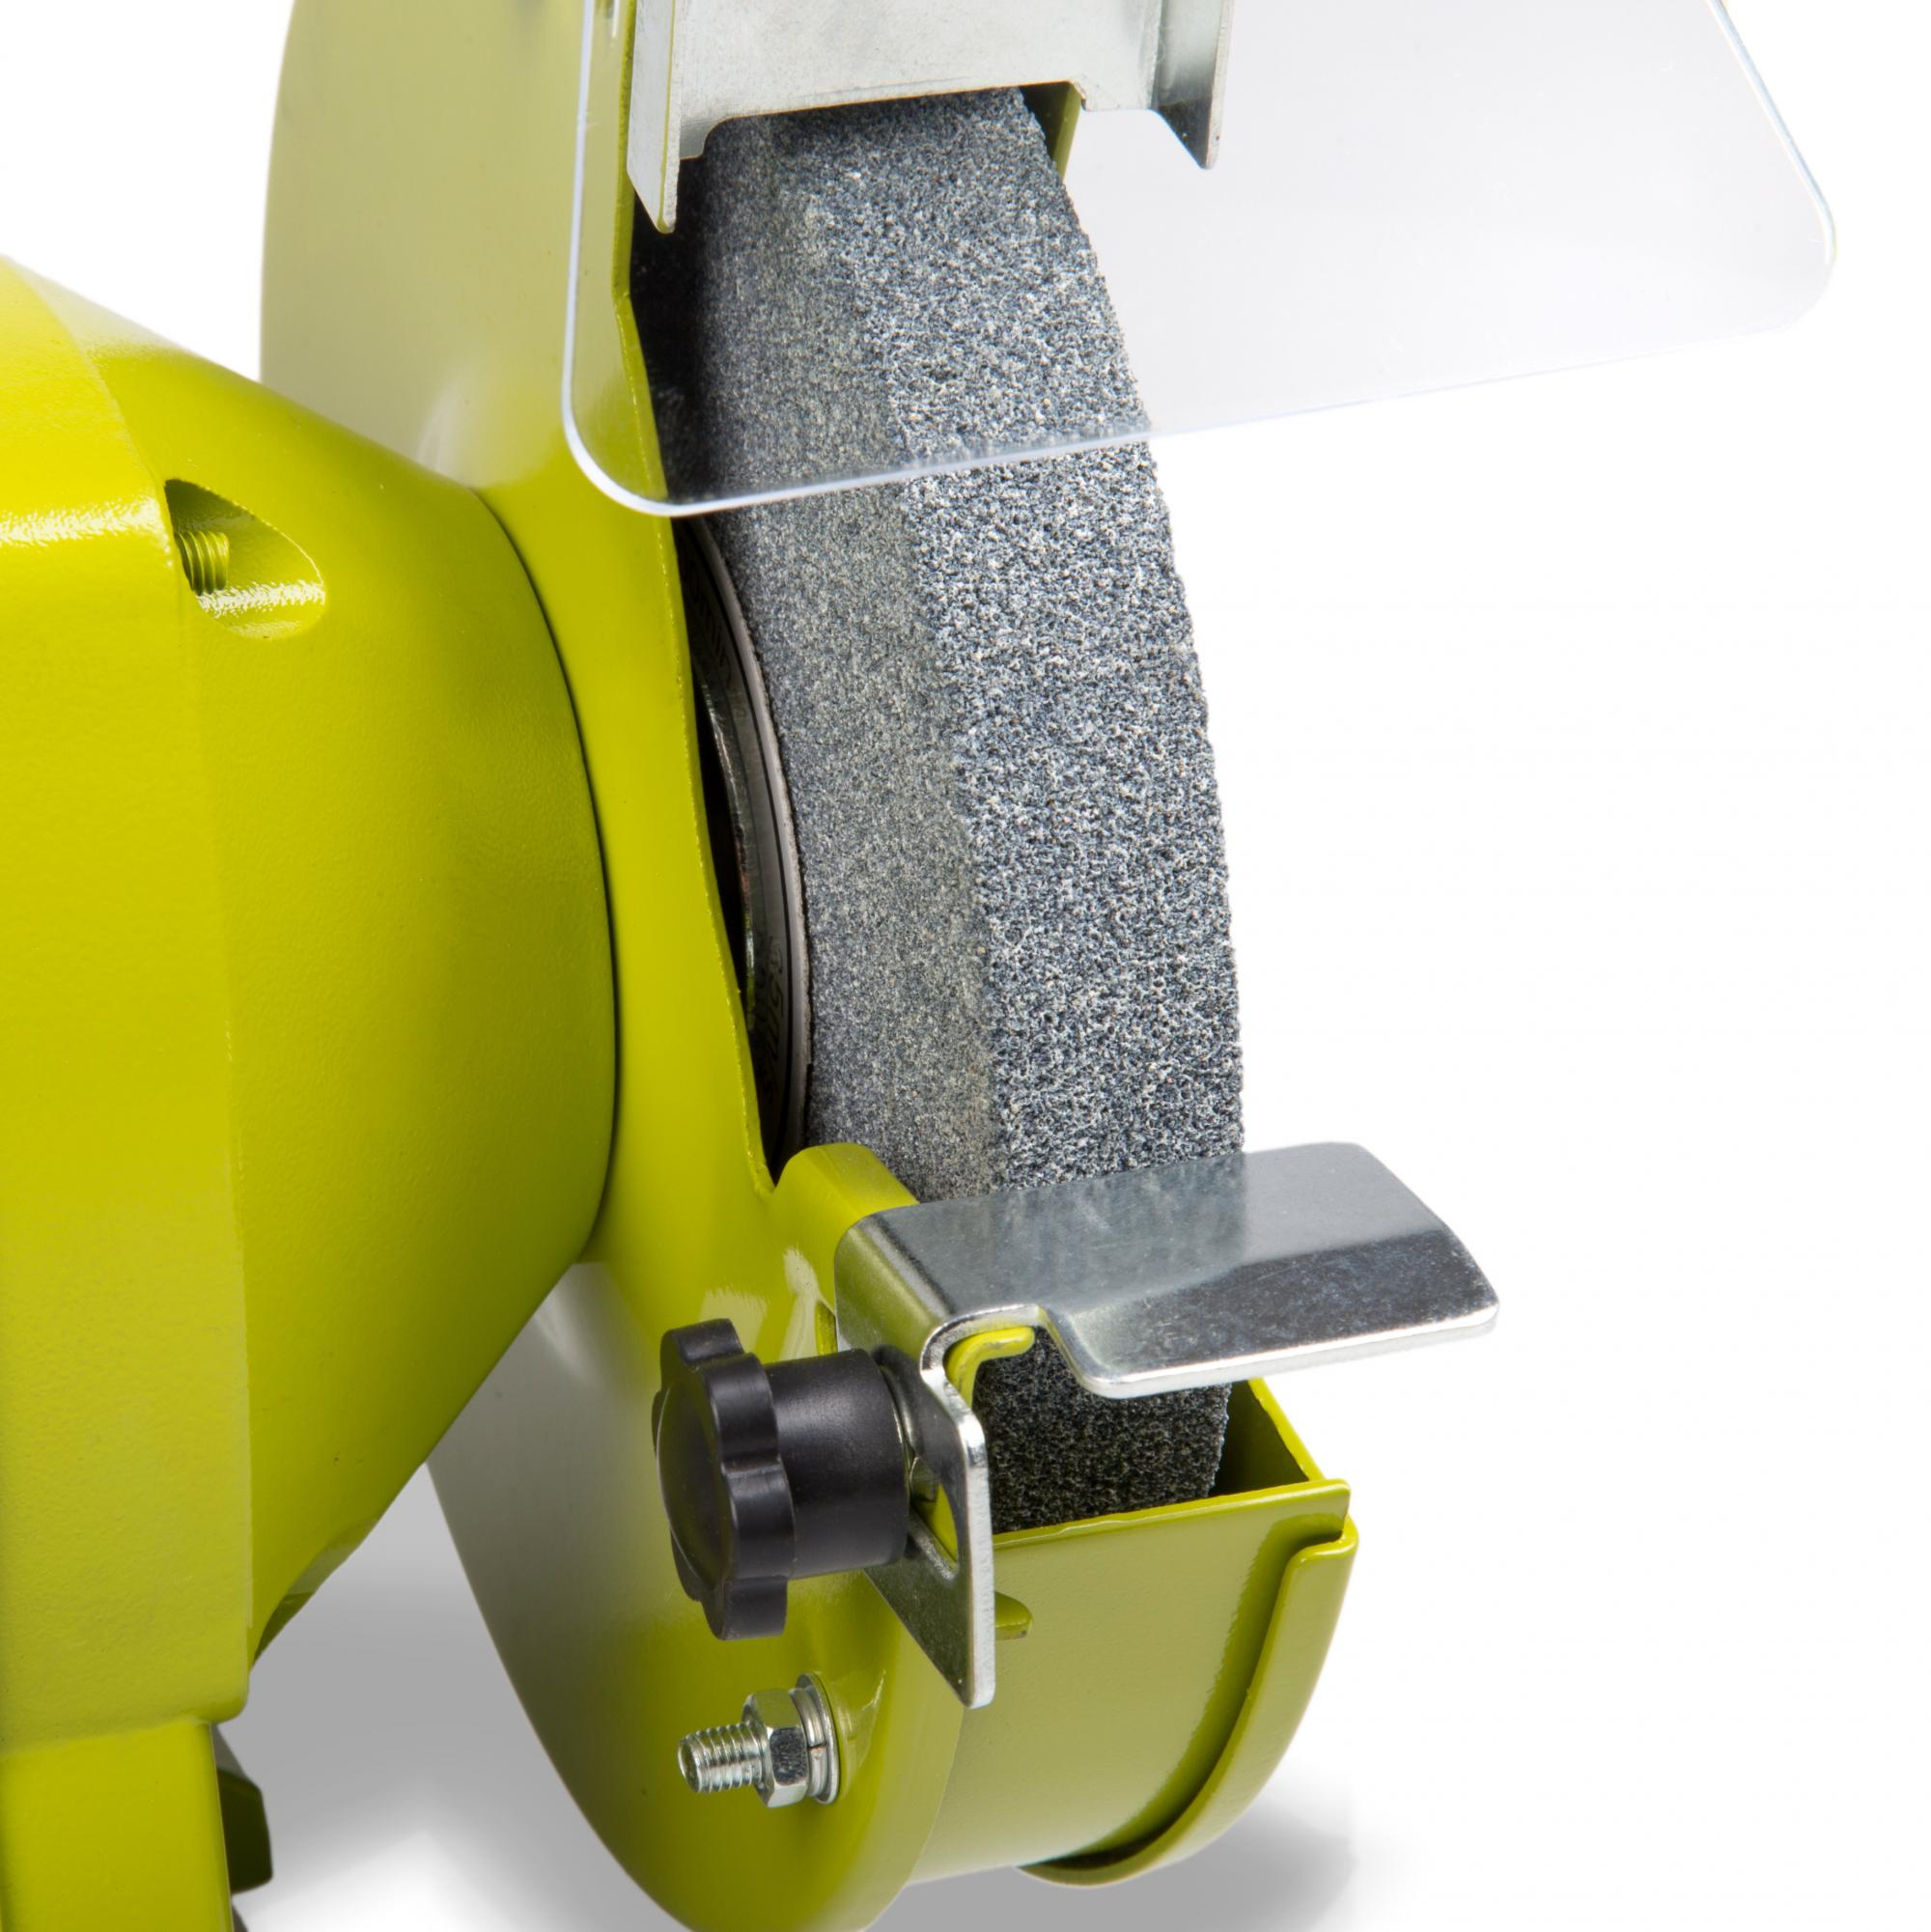 250 watt doppelschleifer 150 mm 200 mm nass trocken fr sen schleifen polieren. Black Bedroom Furniture Sets. Home Design Ideas